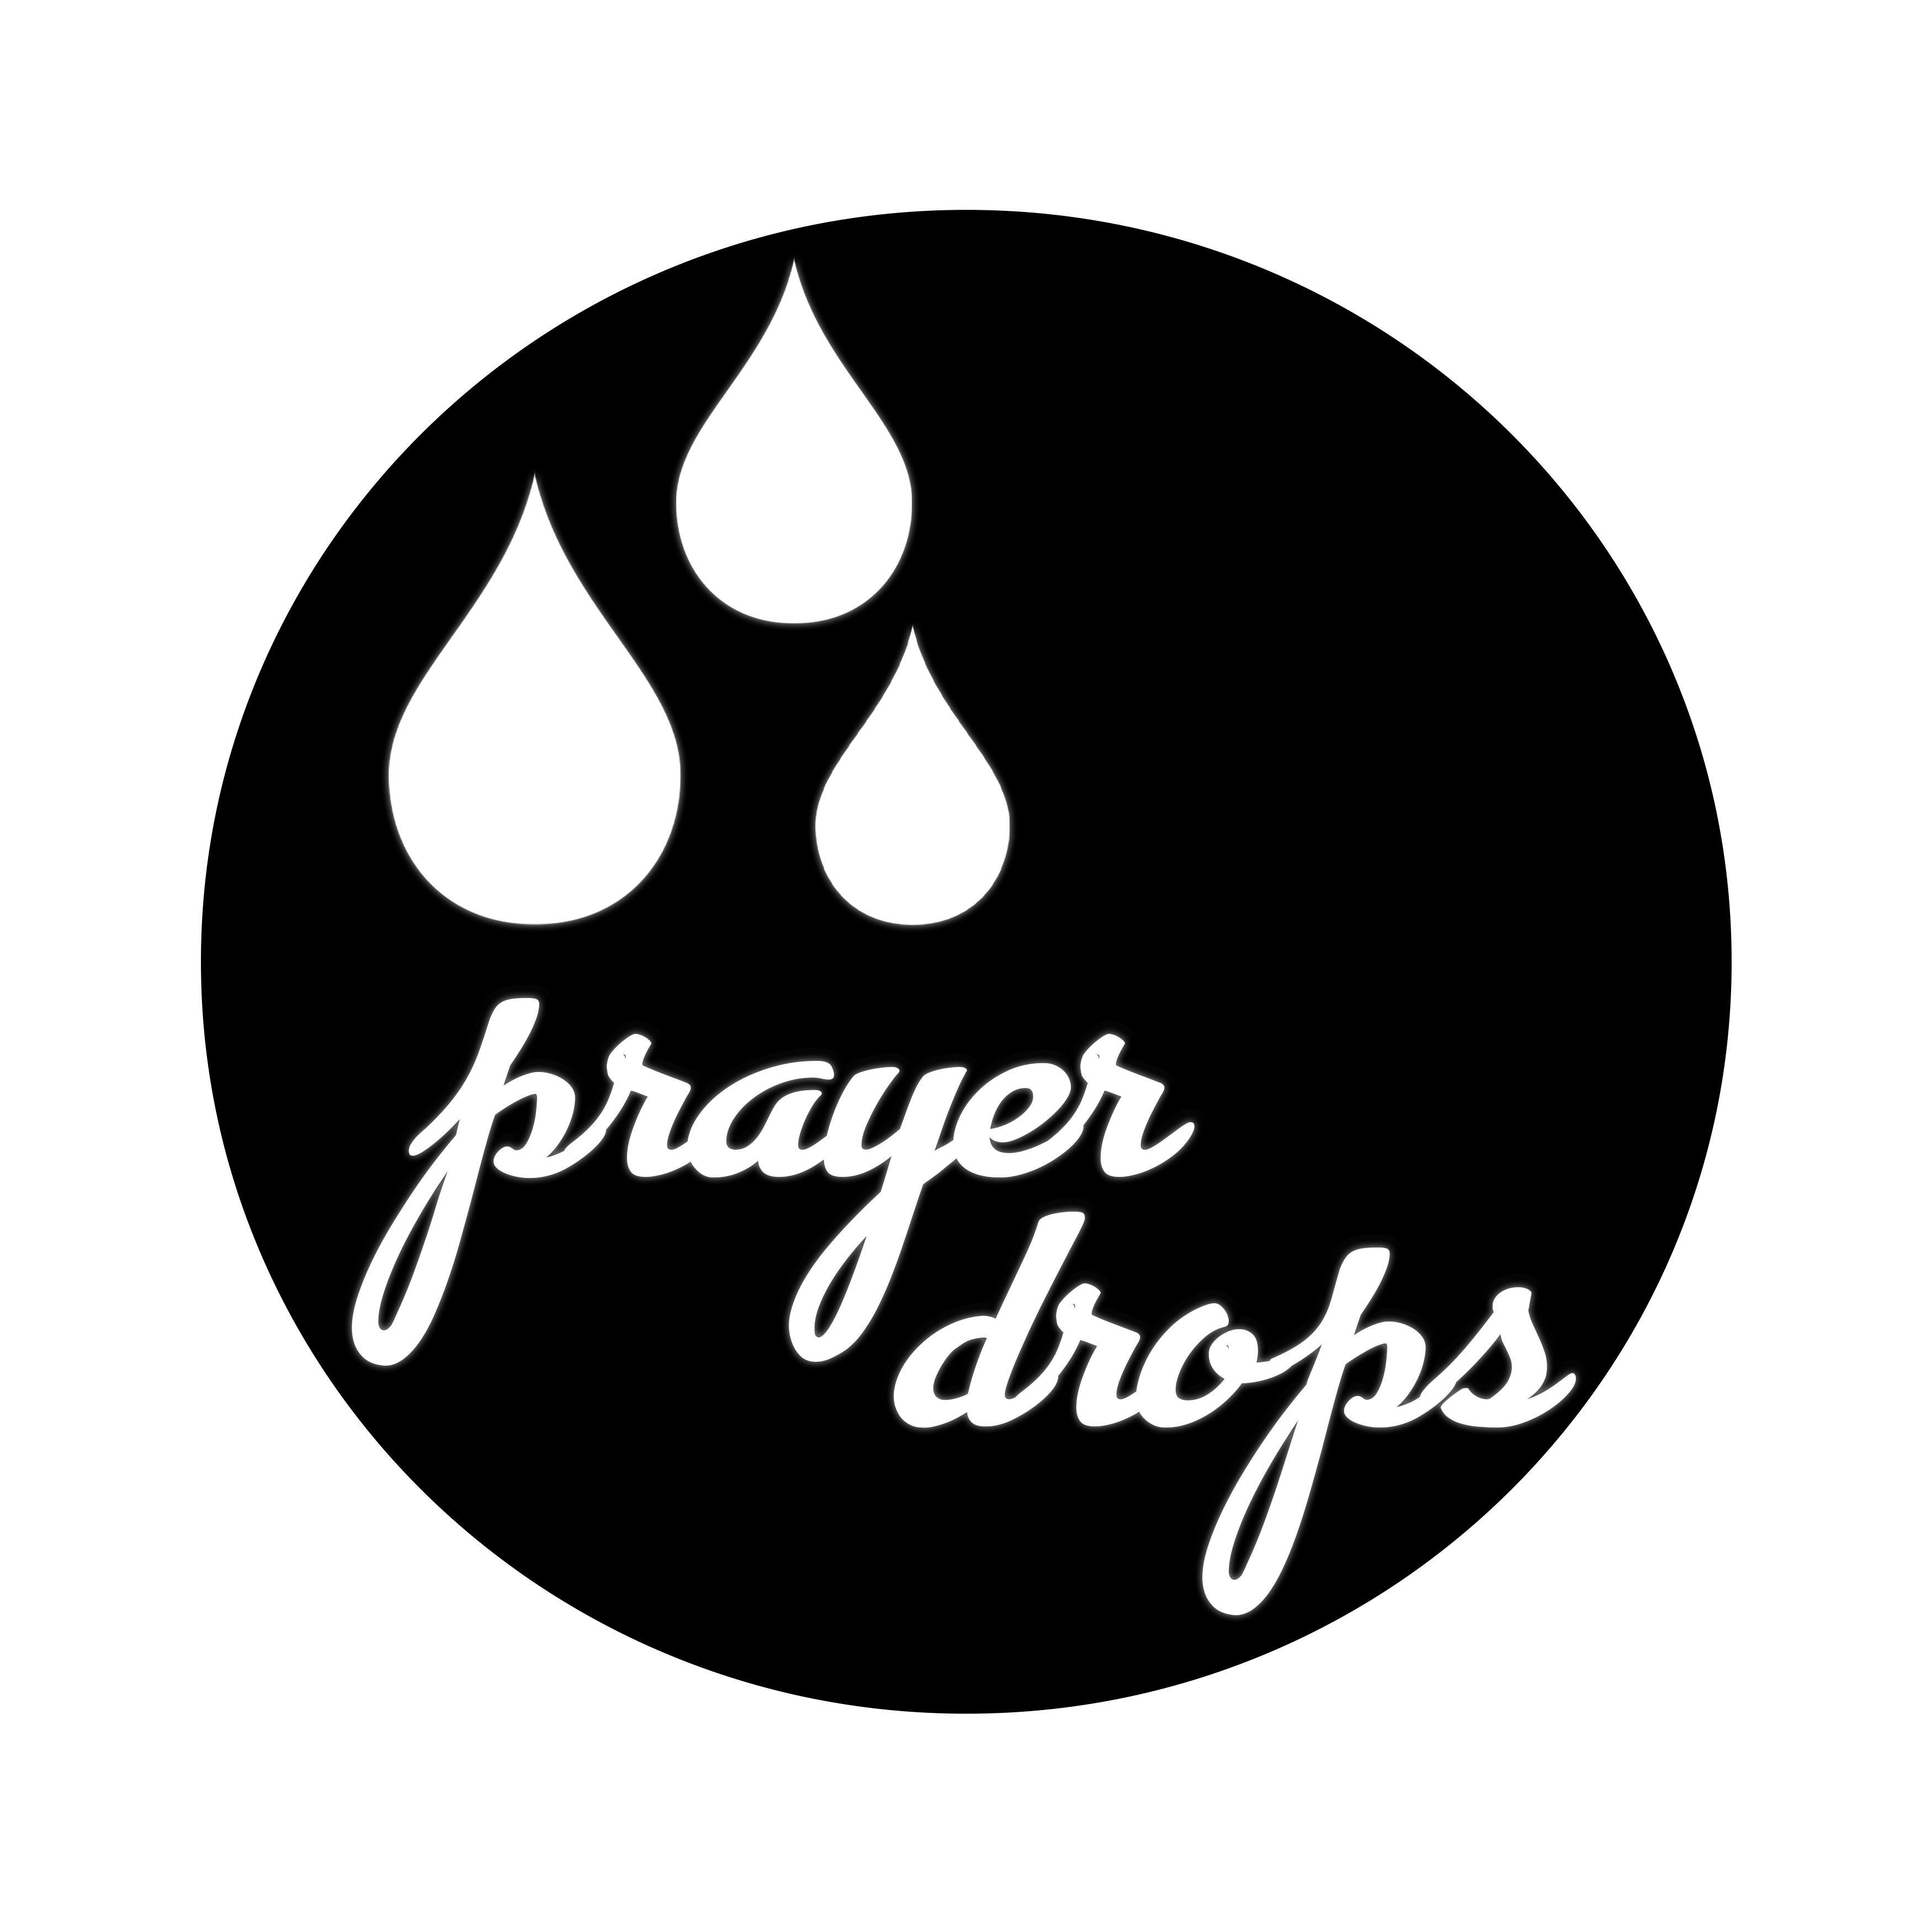 PrayerDrops on Twitter: